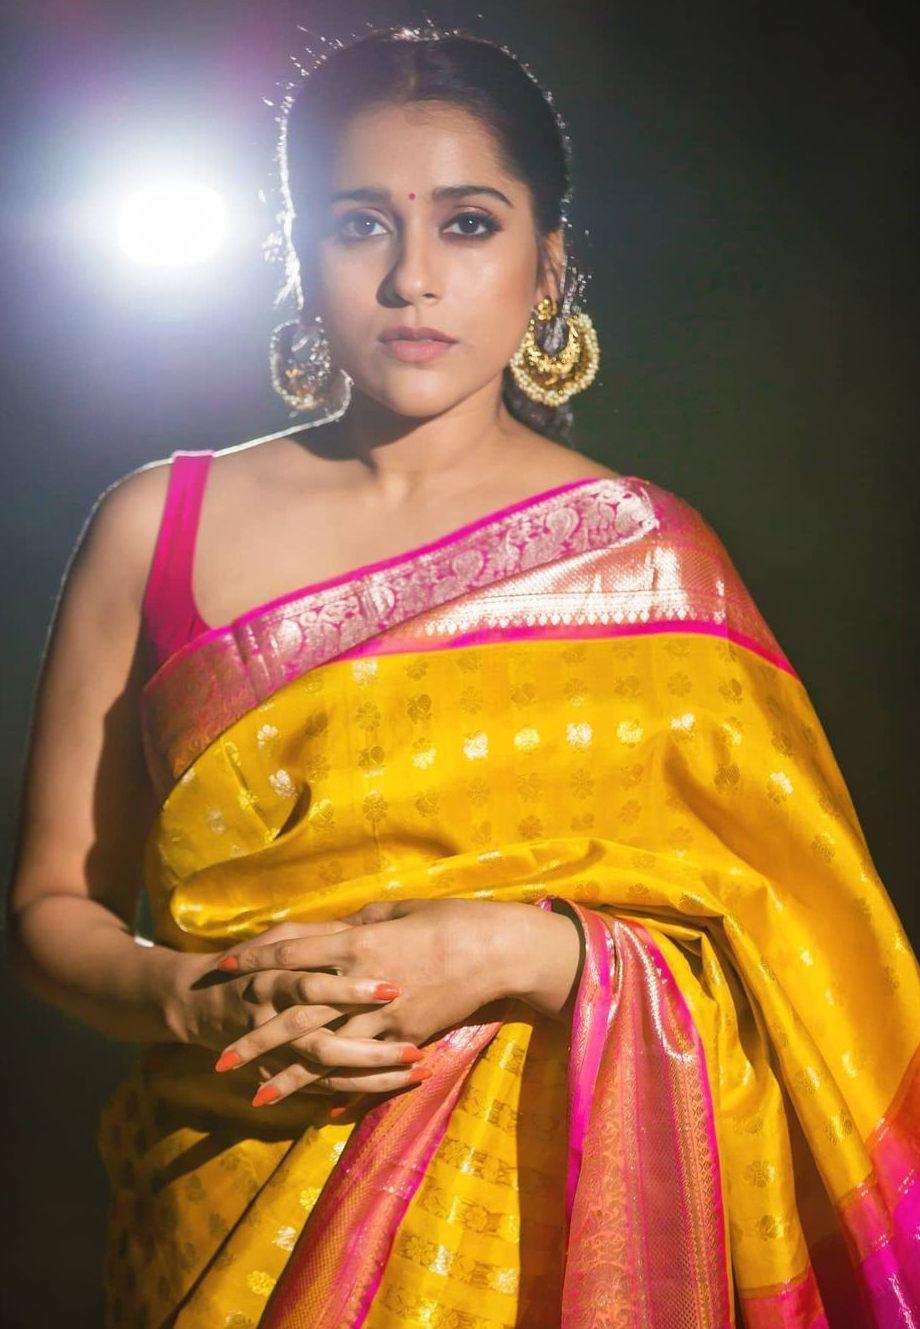 Rashmi gautam in yellow pink pattu saree by rr designs4